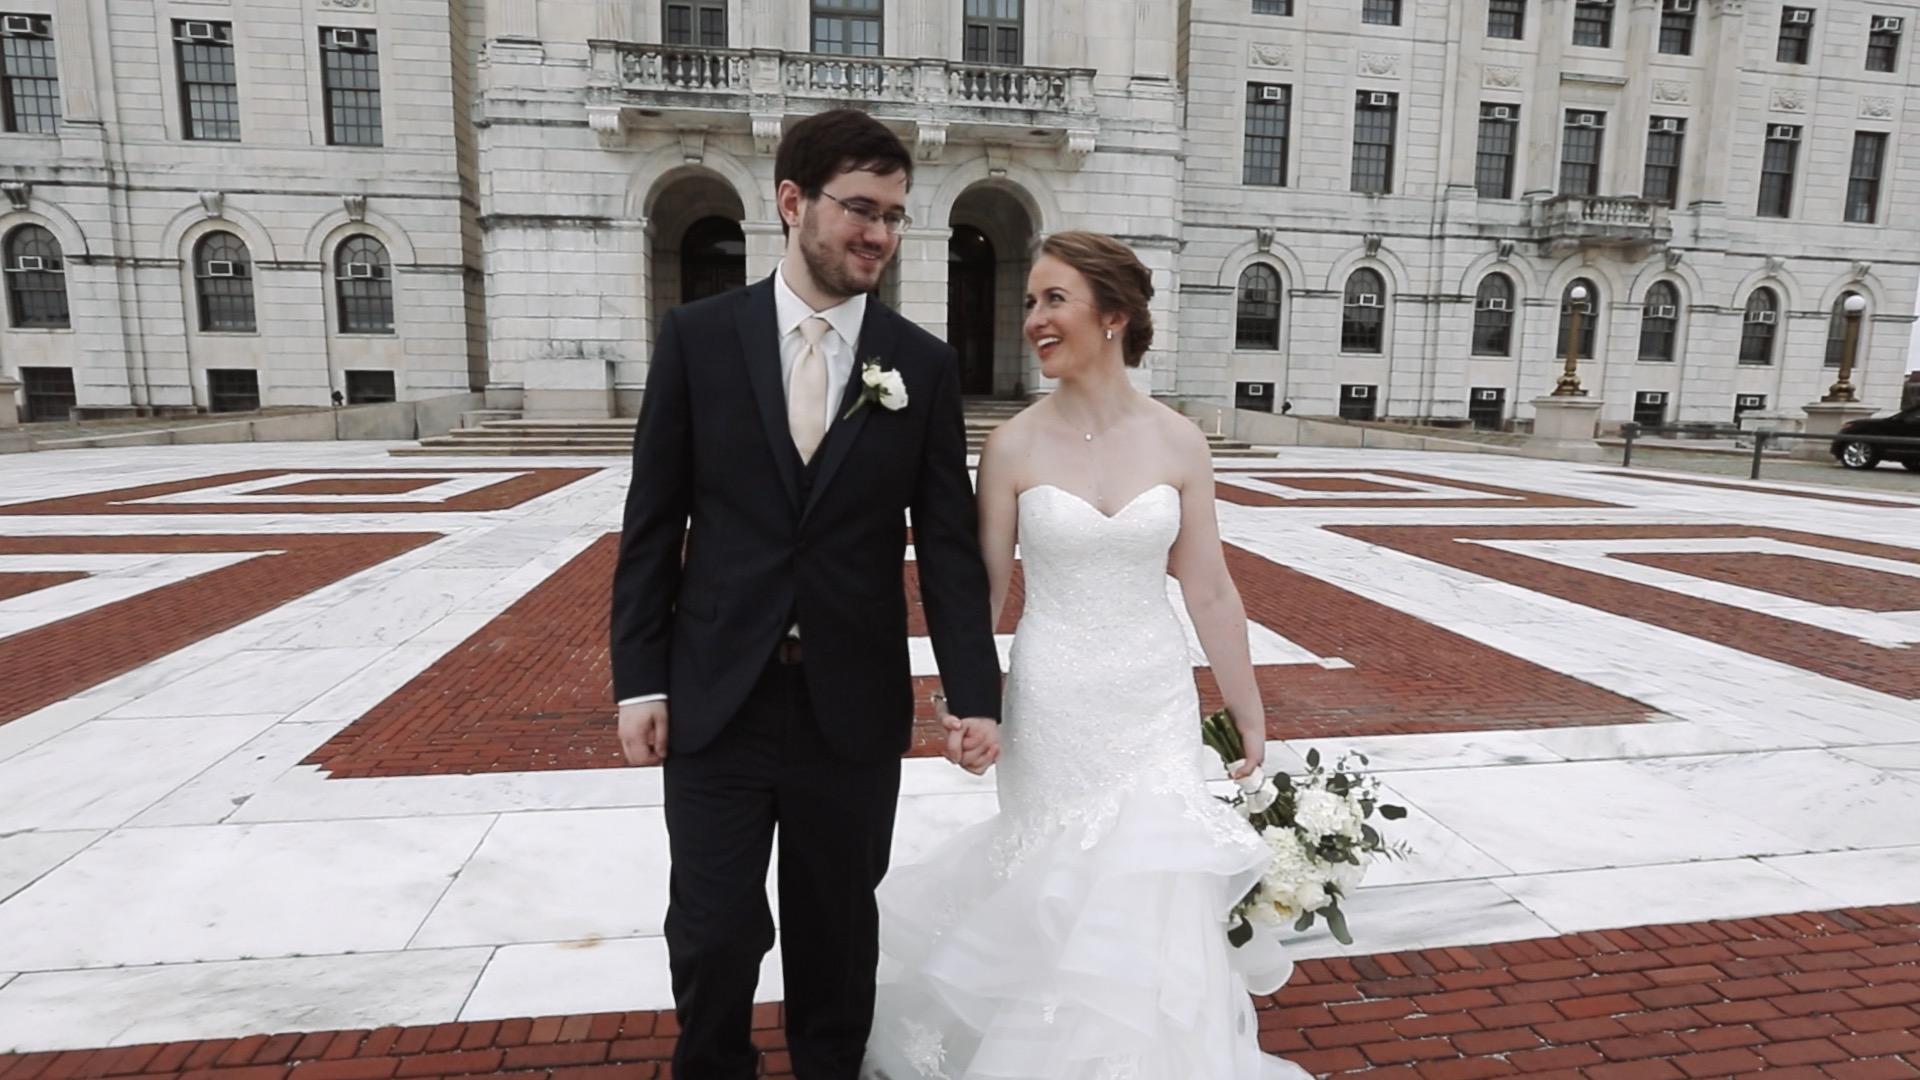 Kayla + Robert | Providence, Rhode Island